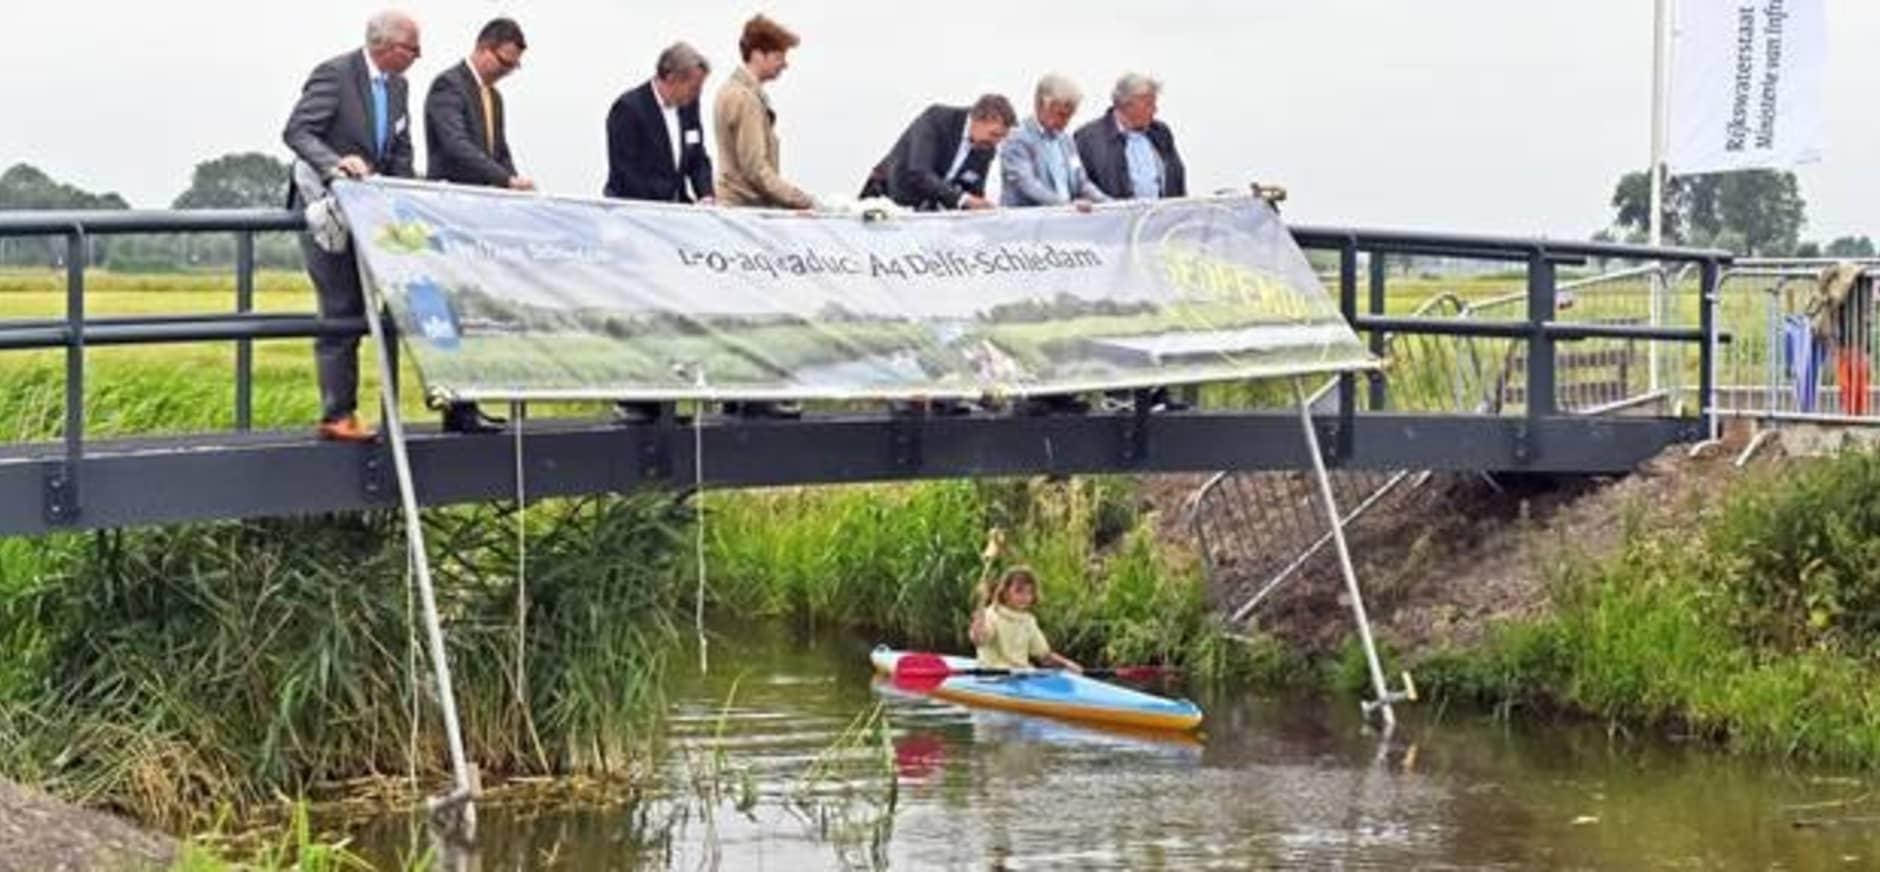 Grootste eco-aquaduct A4 Delft-Schiedam geopend